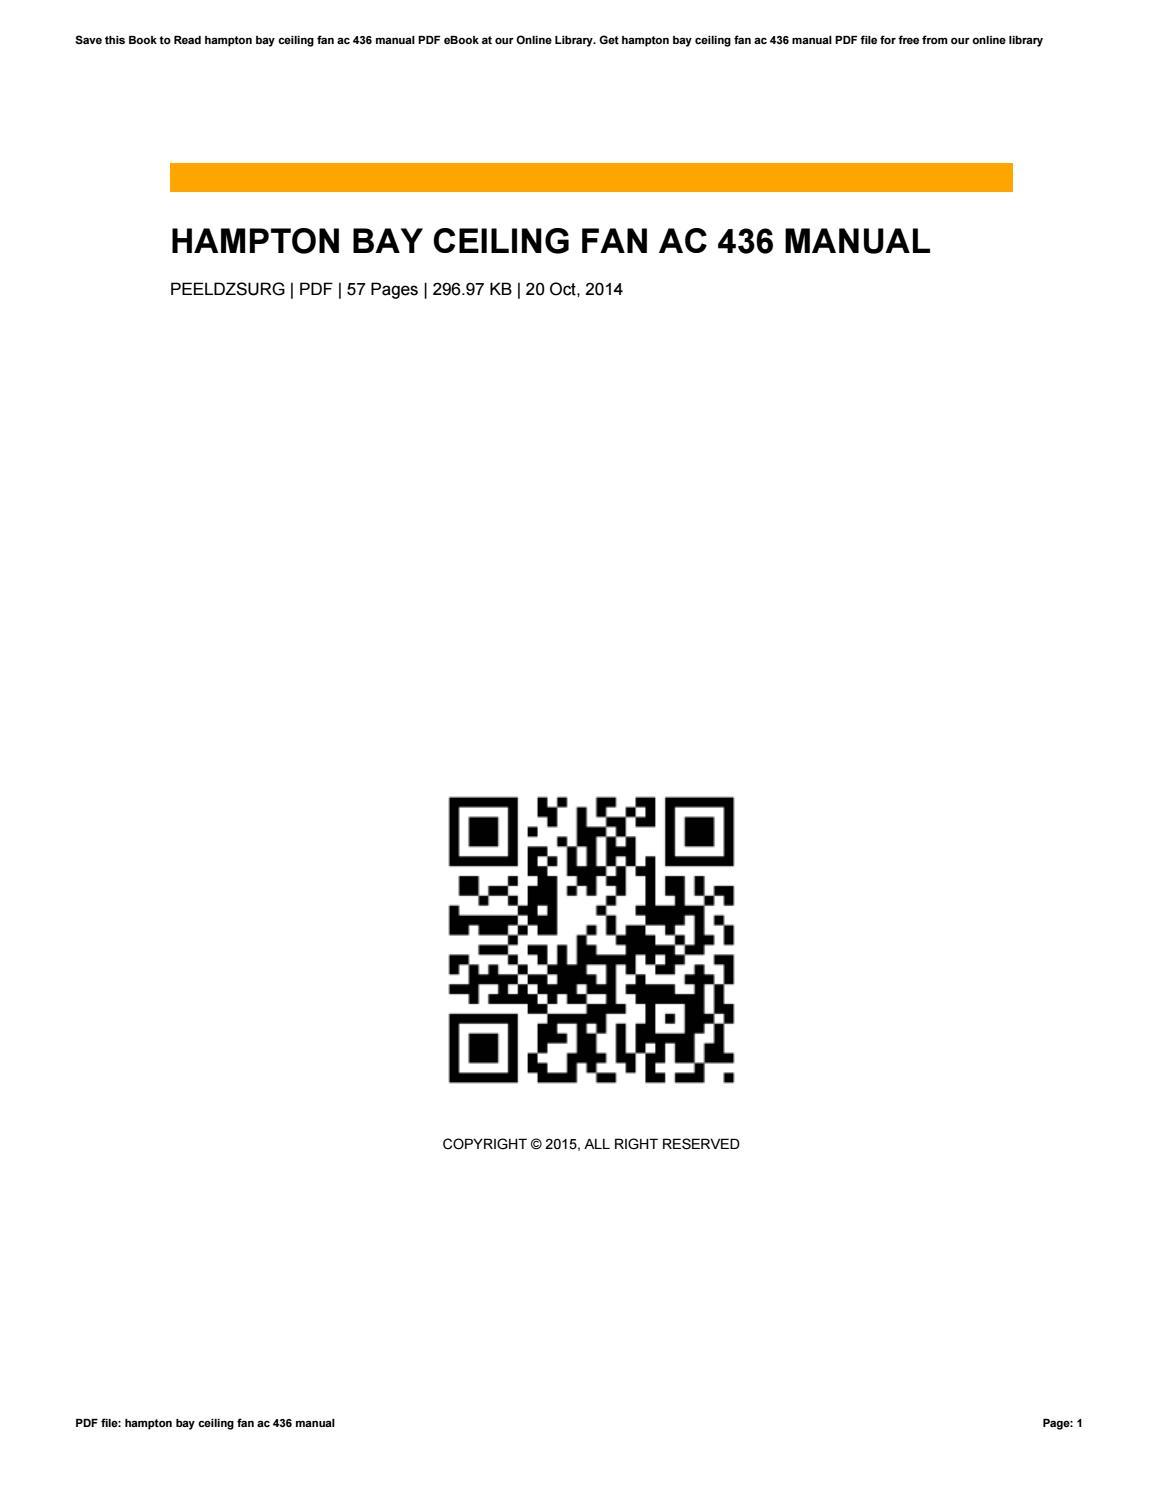 Hampton Bay Ceiling Fans Manual